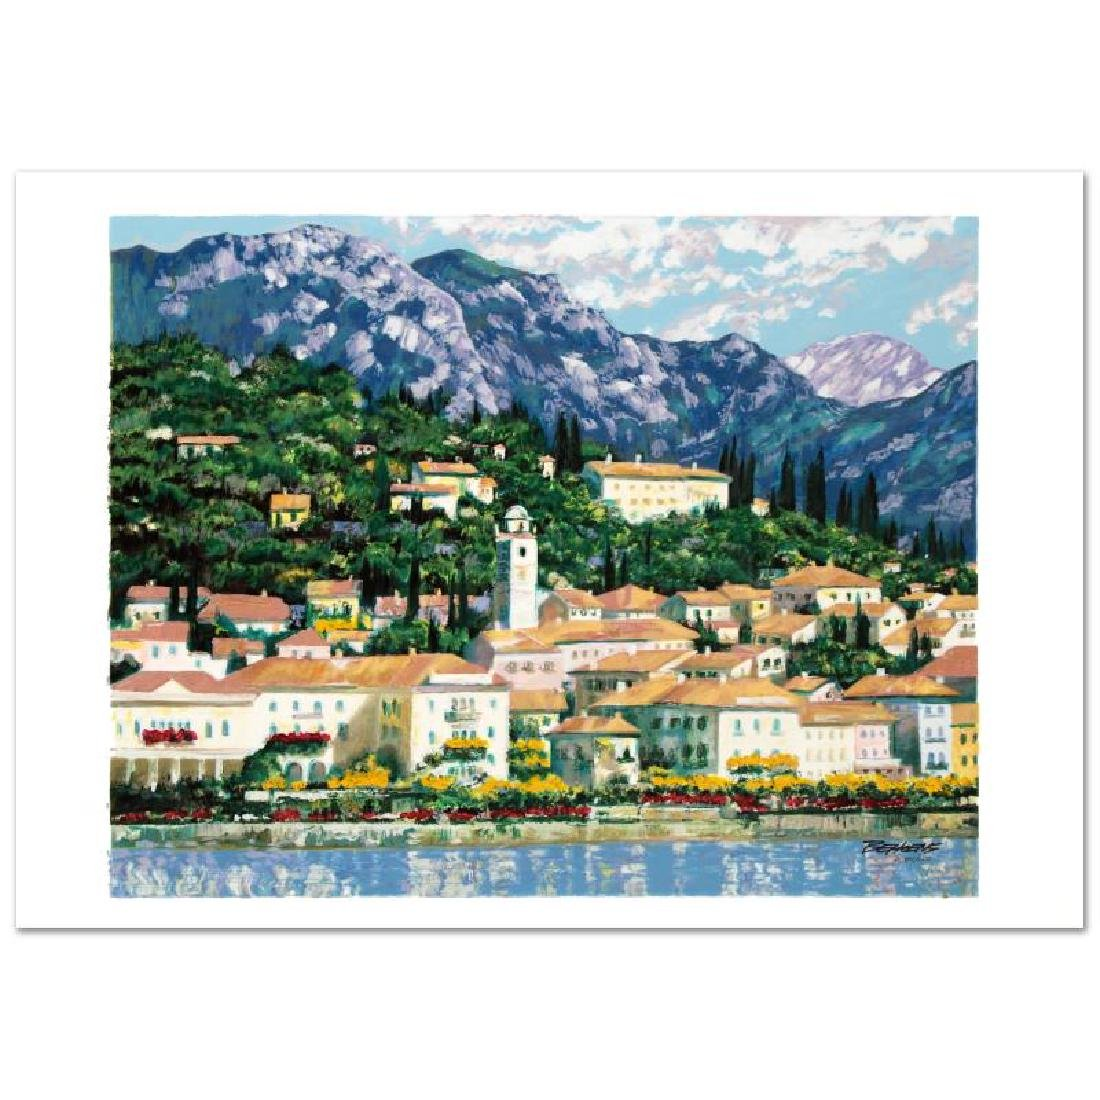 """Bellagio Hillside"" Embellished Limited Edition"